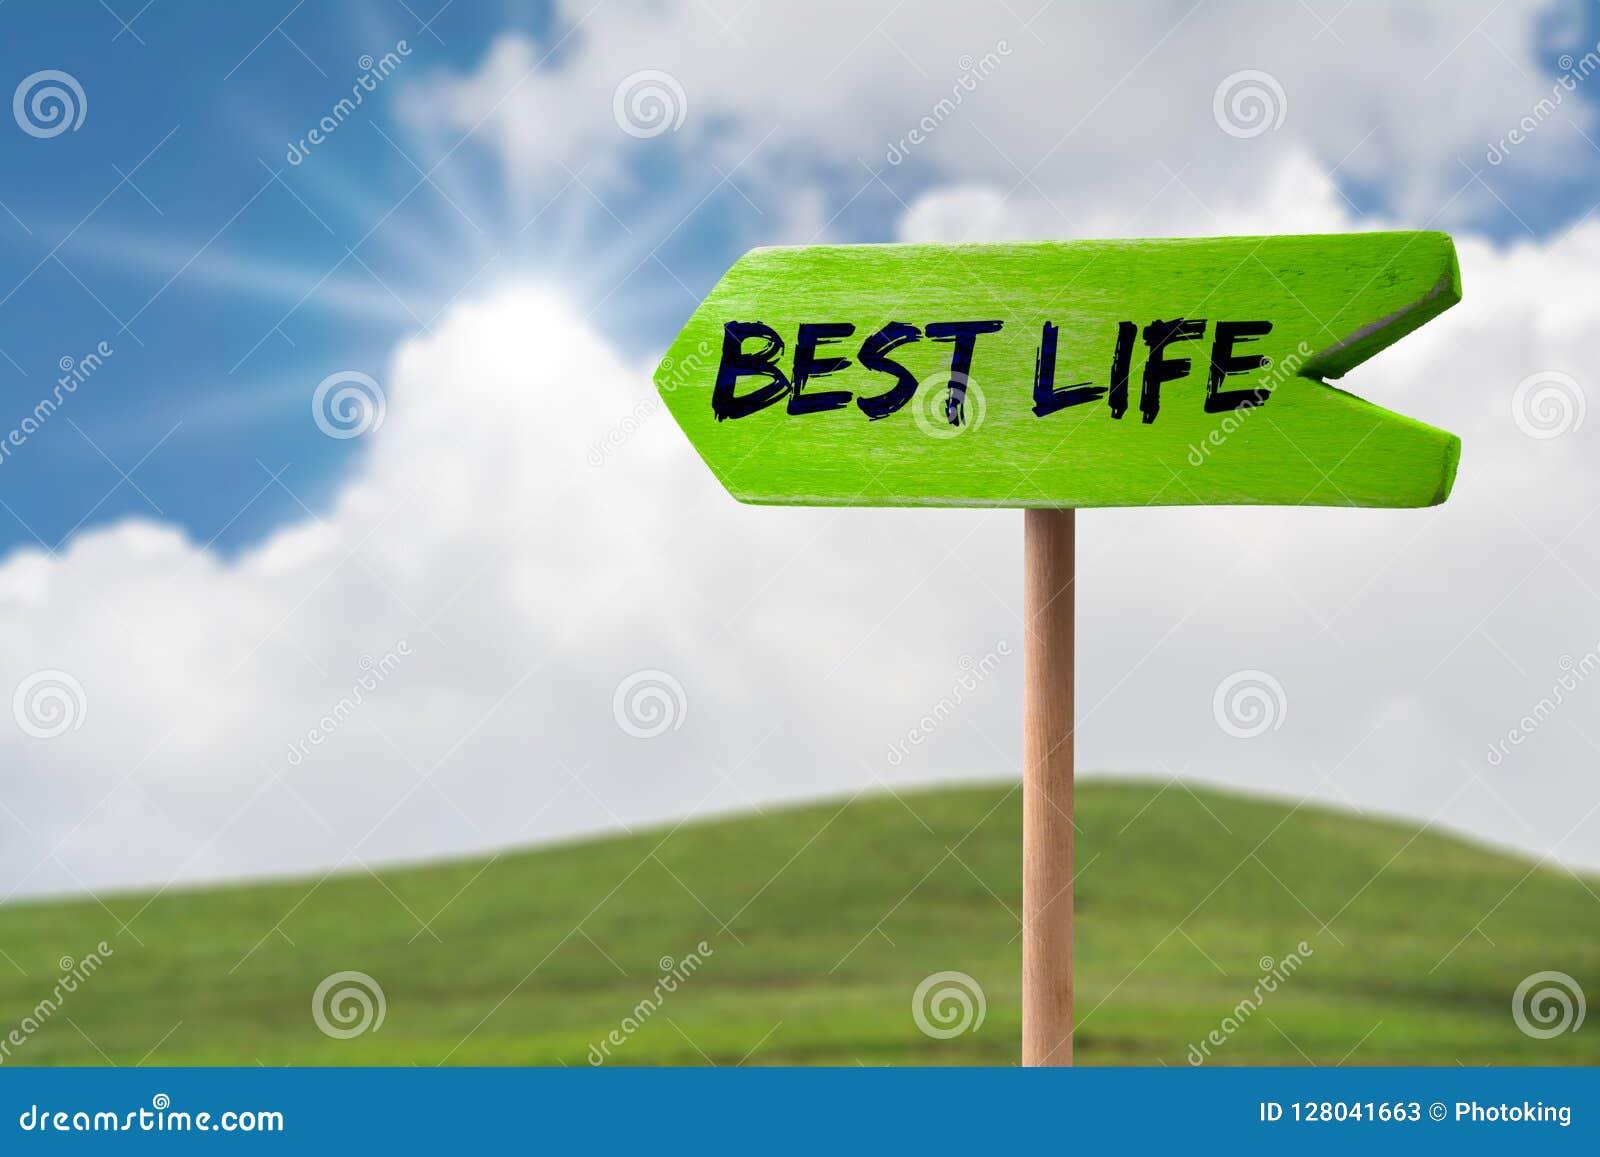 Best life arrow sign